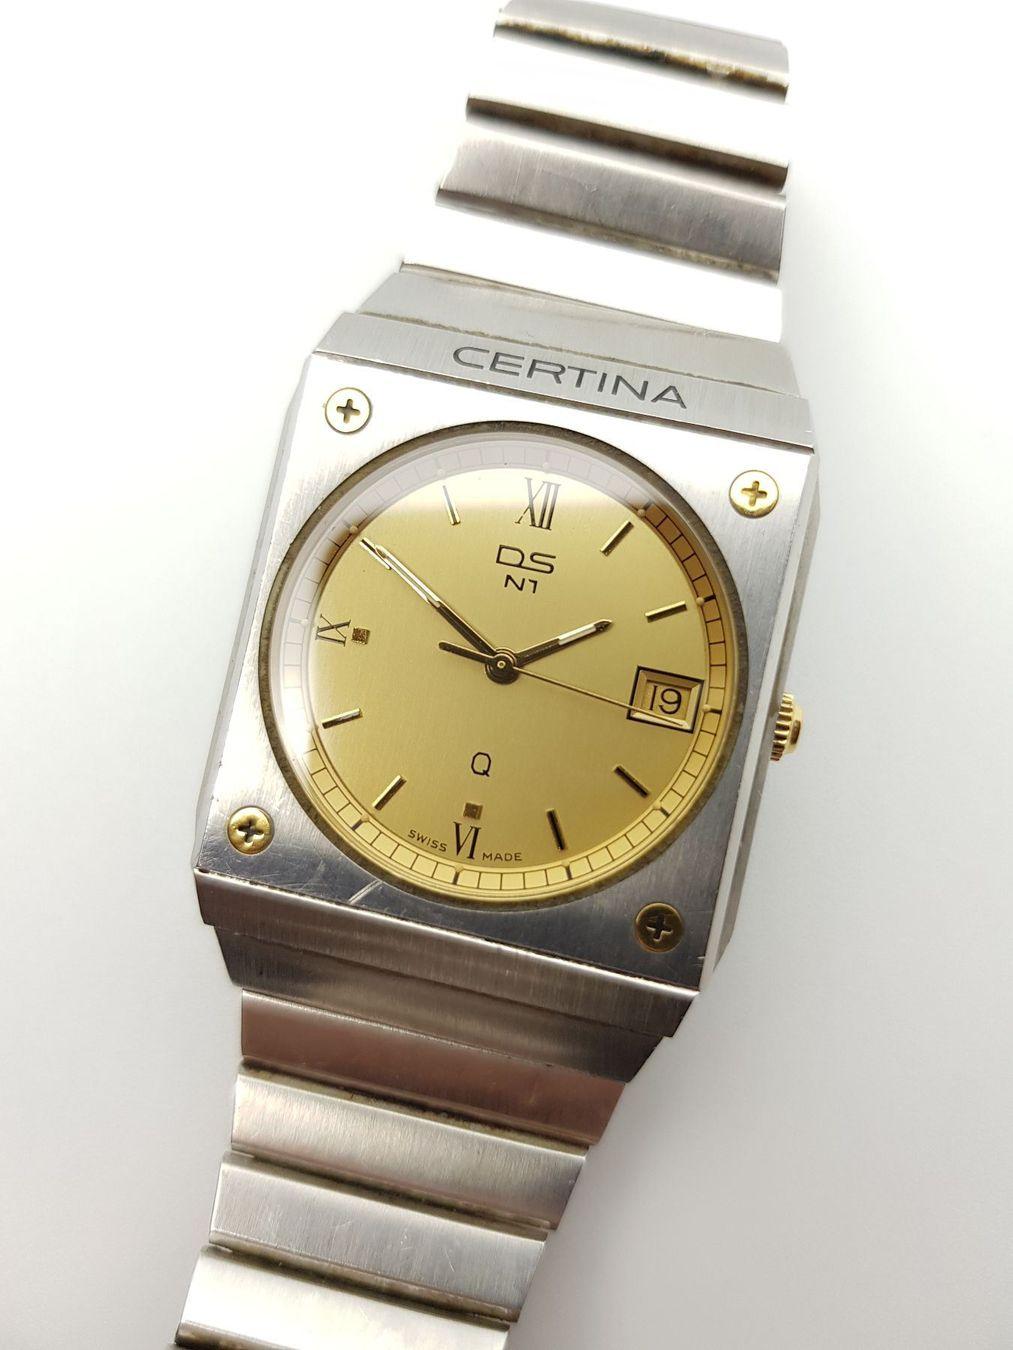 Certina - Anos 80 Certin13